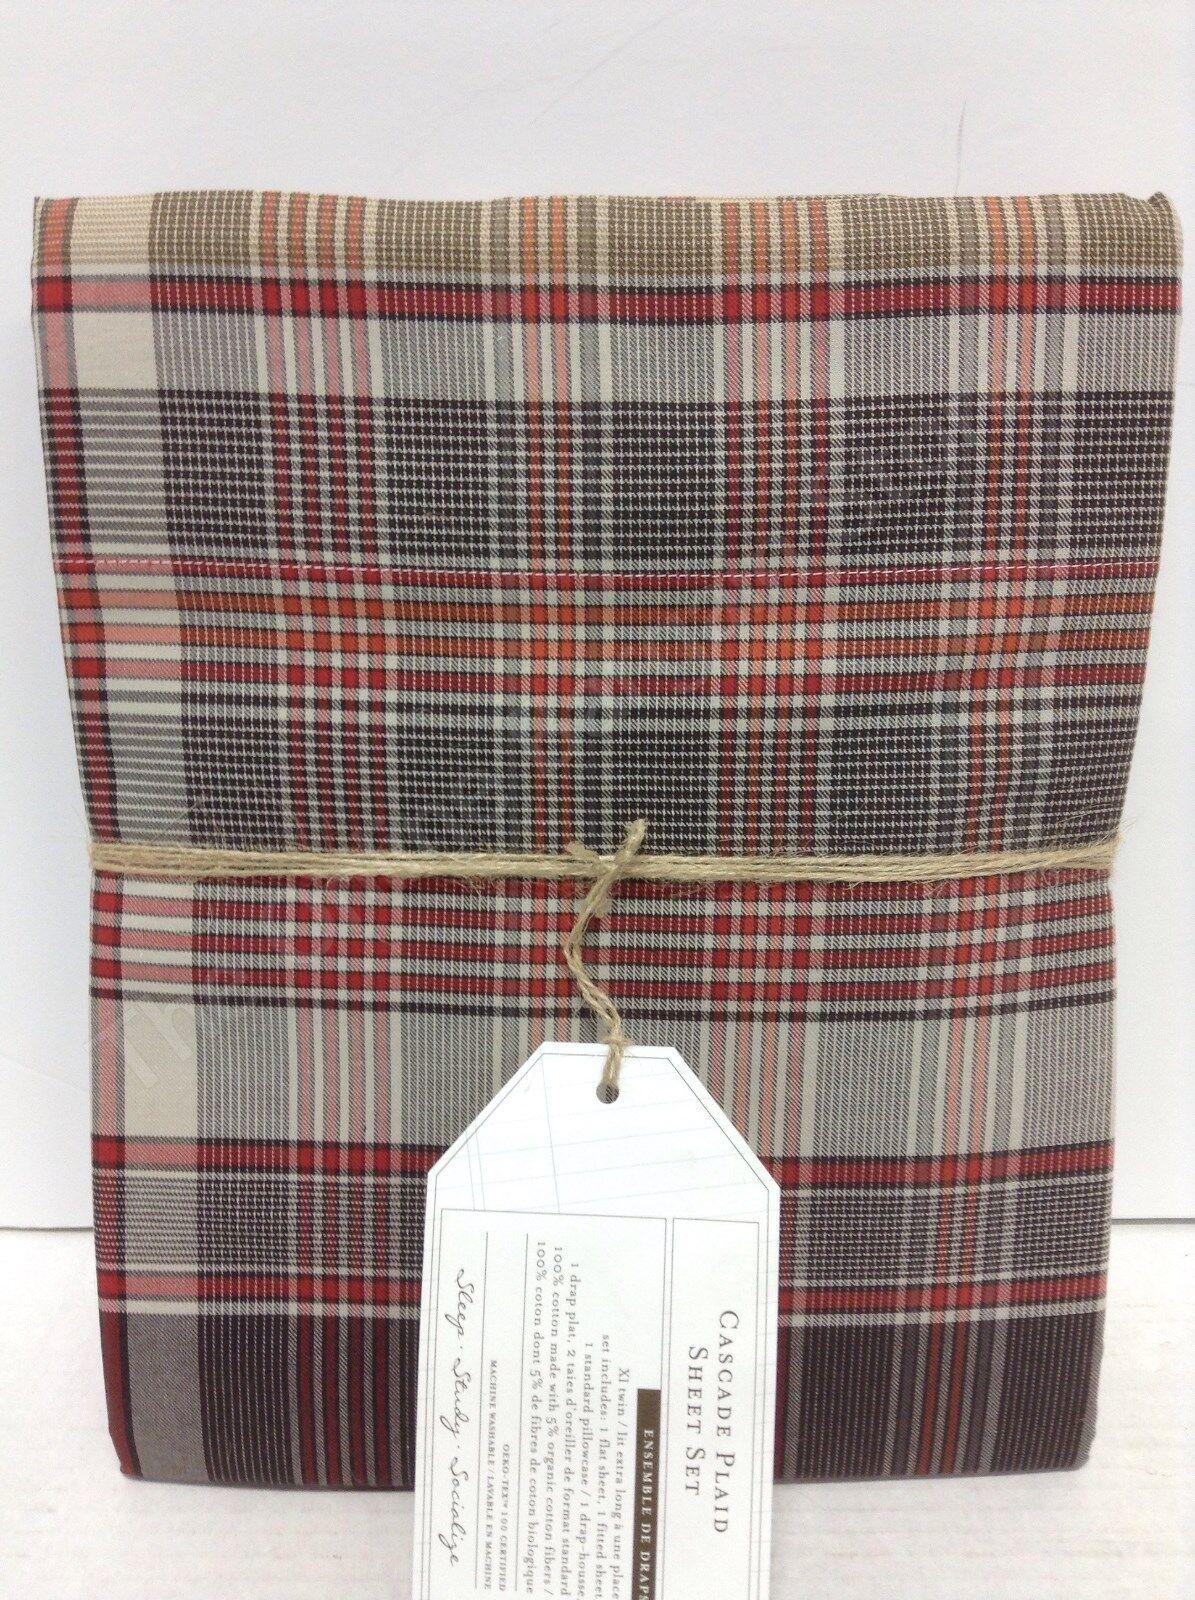 Pottery Barn Teen PBT Cascade Plaid Twin XL Sheet Set Brown Red Stripe Country